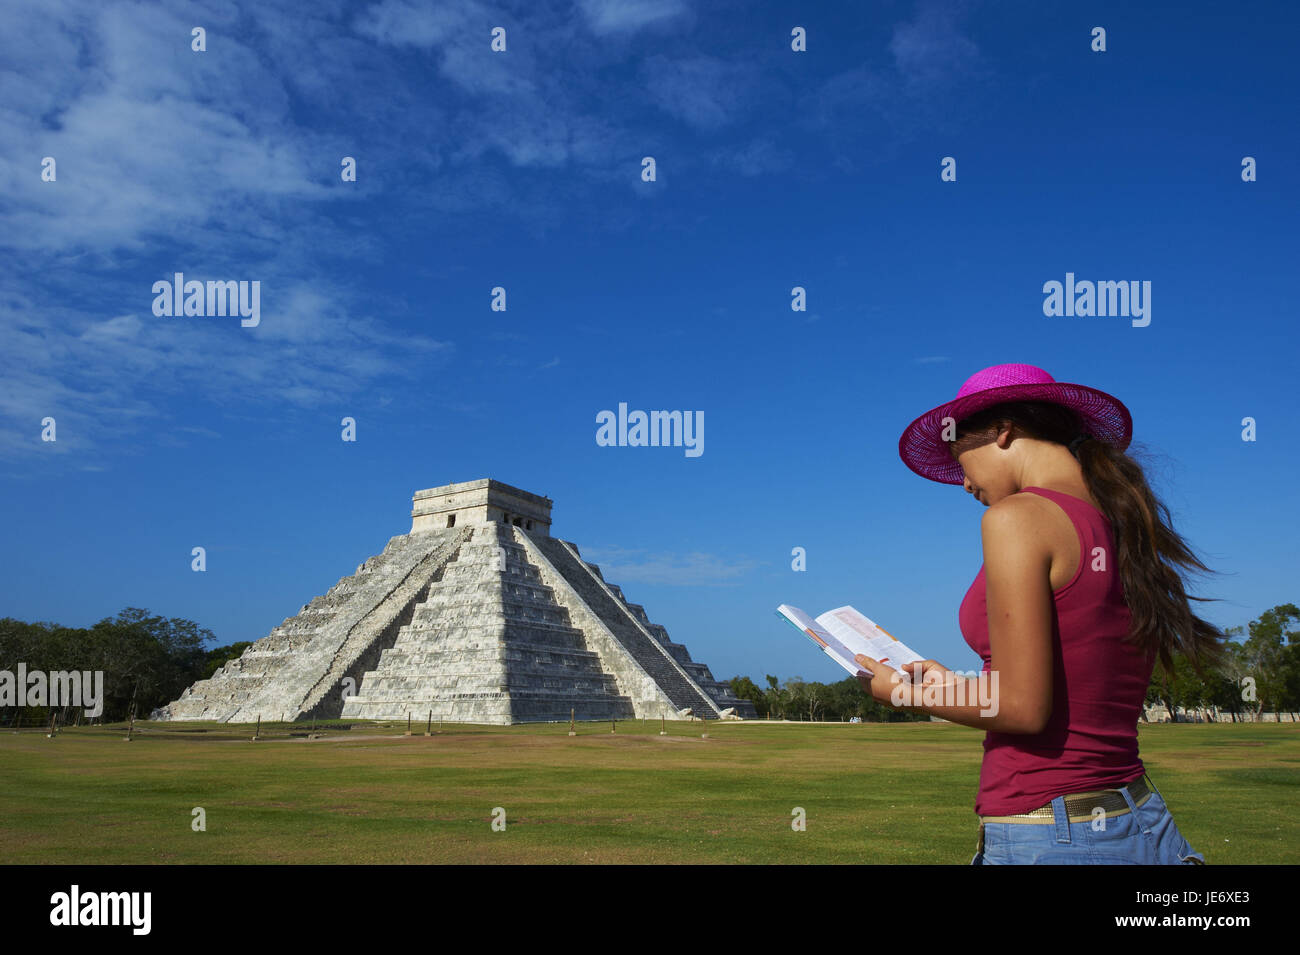 Mexico, Yucatan, Chichen Itza ruin town, UNESCO world heritage, historical Maya ruins, pyramid of the Kukulcan or - Stock Image